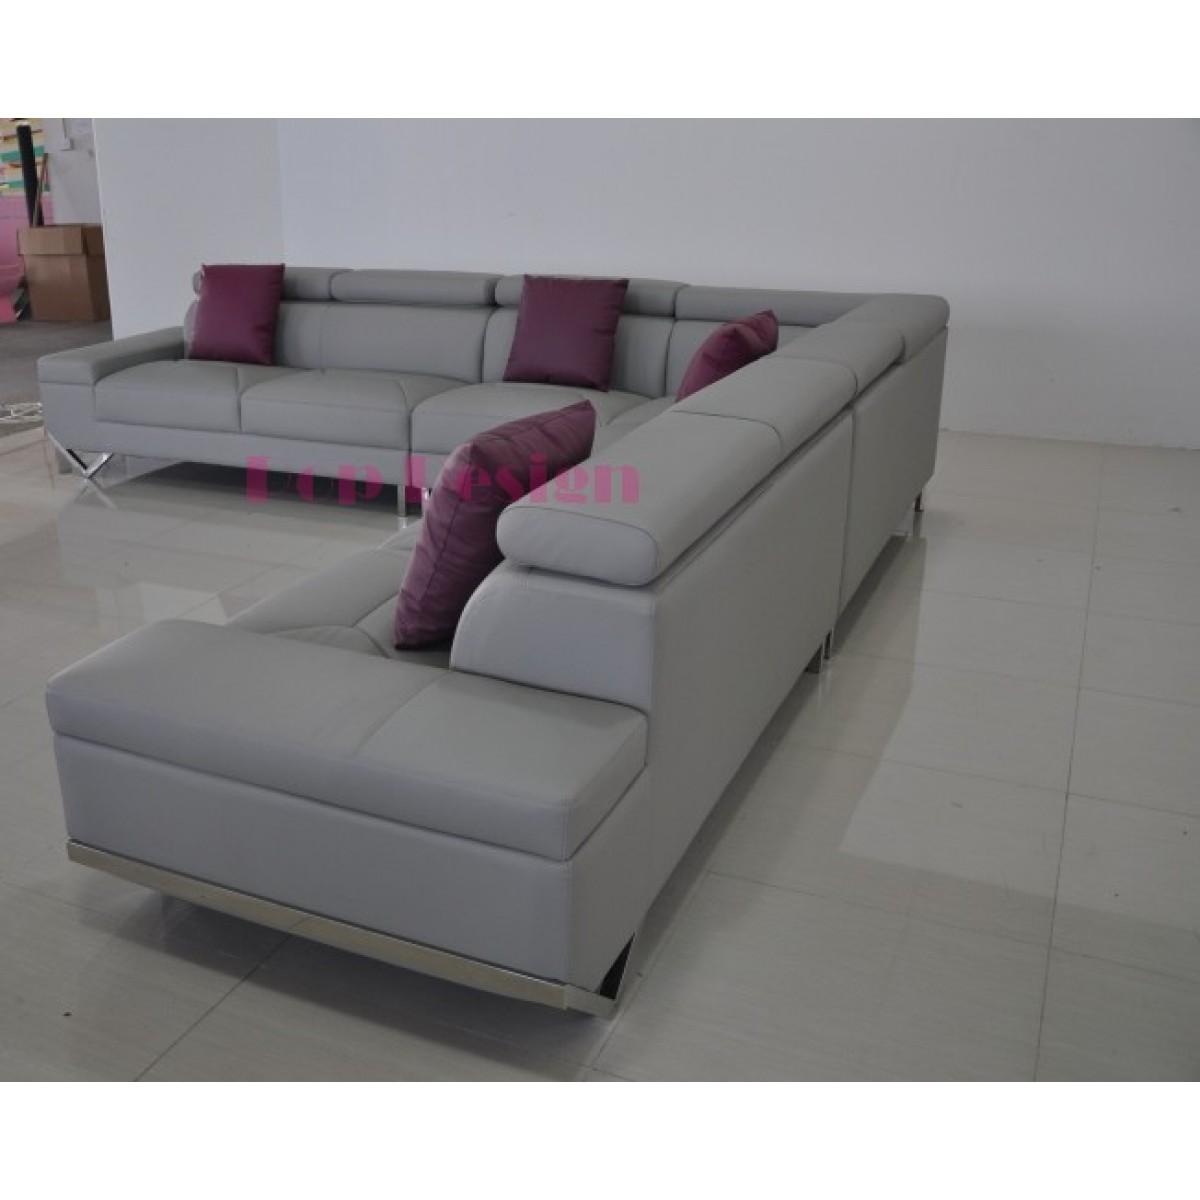 grand canap d 39 angle en cuir v ritable siena 350x350. Black Bedroom Furniture Sets. Home Design Ideas